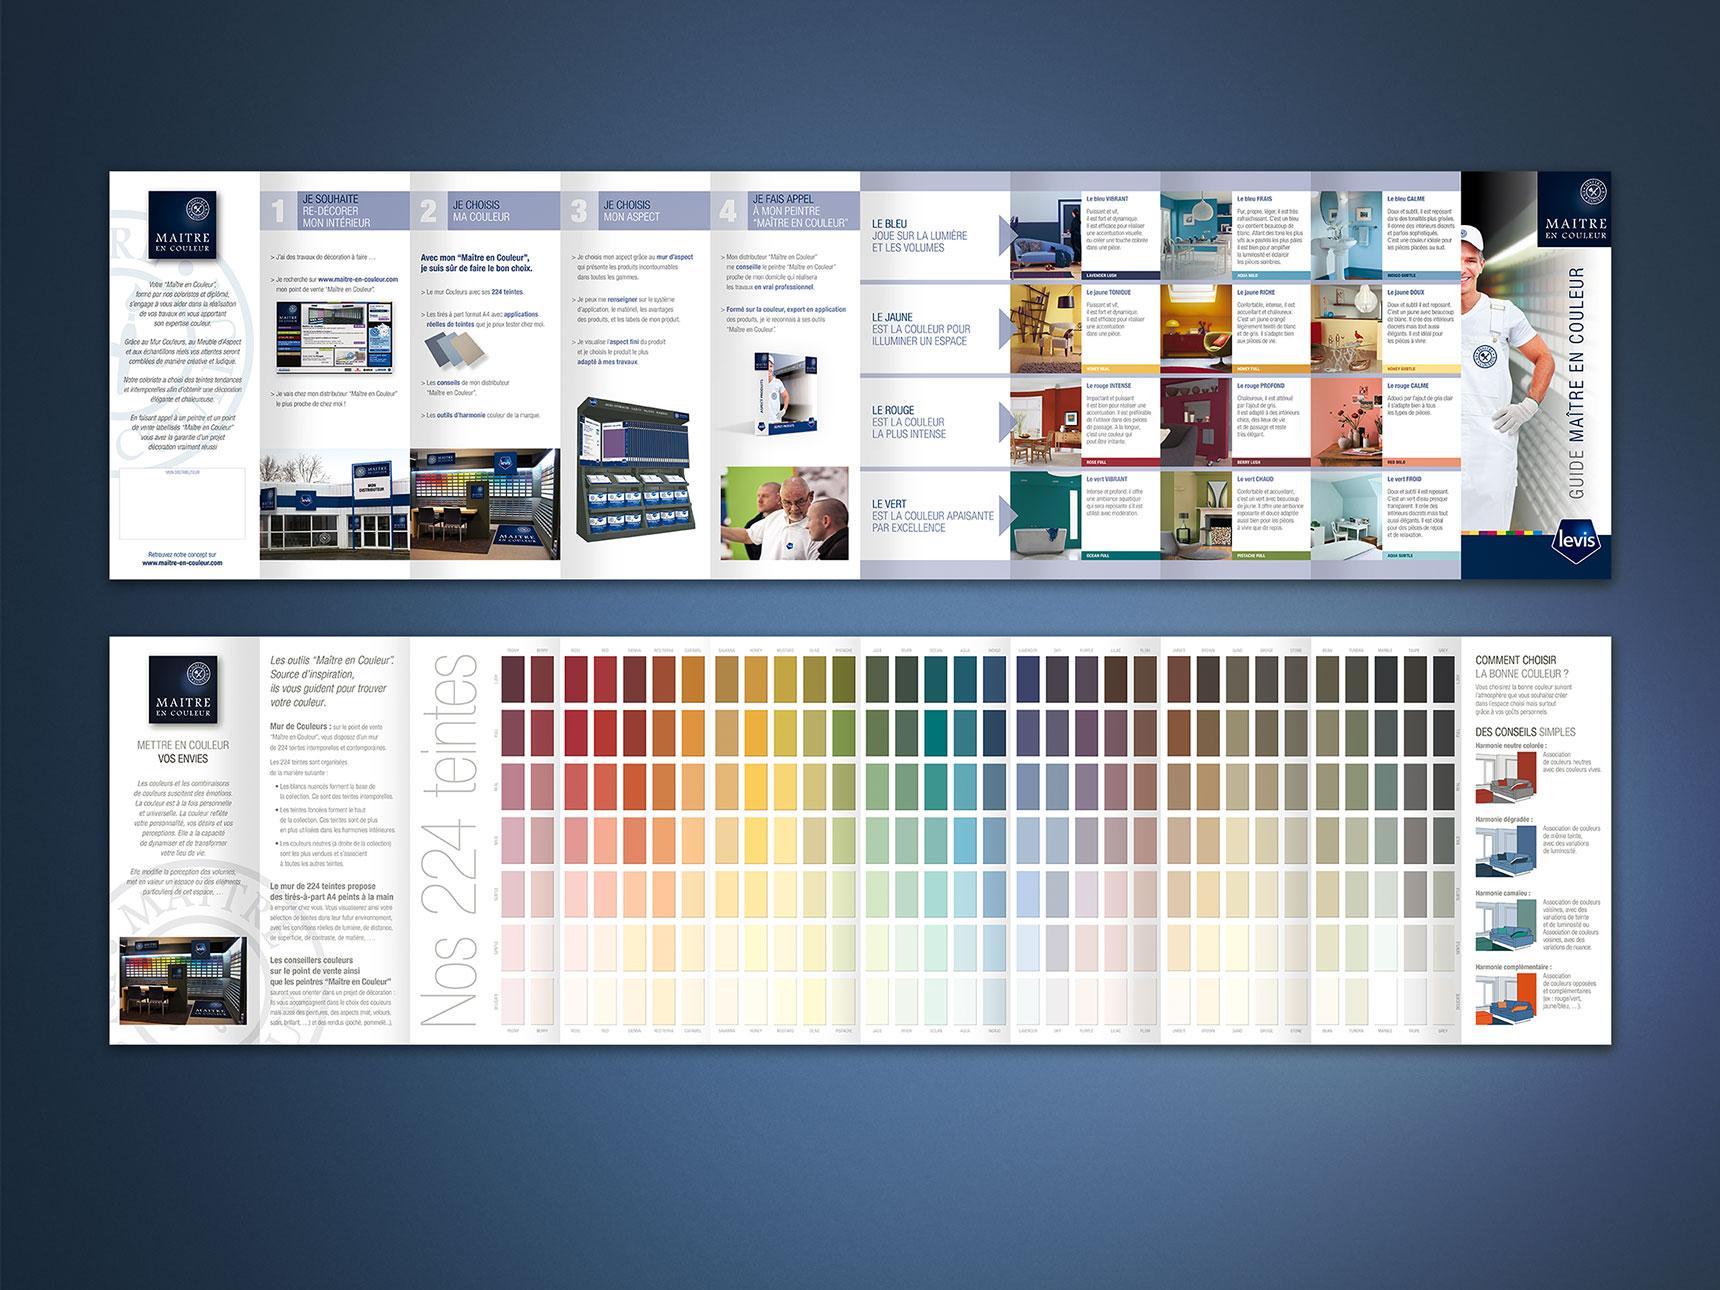 catalogue couleur peinture astral tunisie 20170606232509. Black Bedroom Furniture Sets. Home Design Ideas